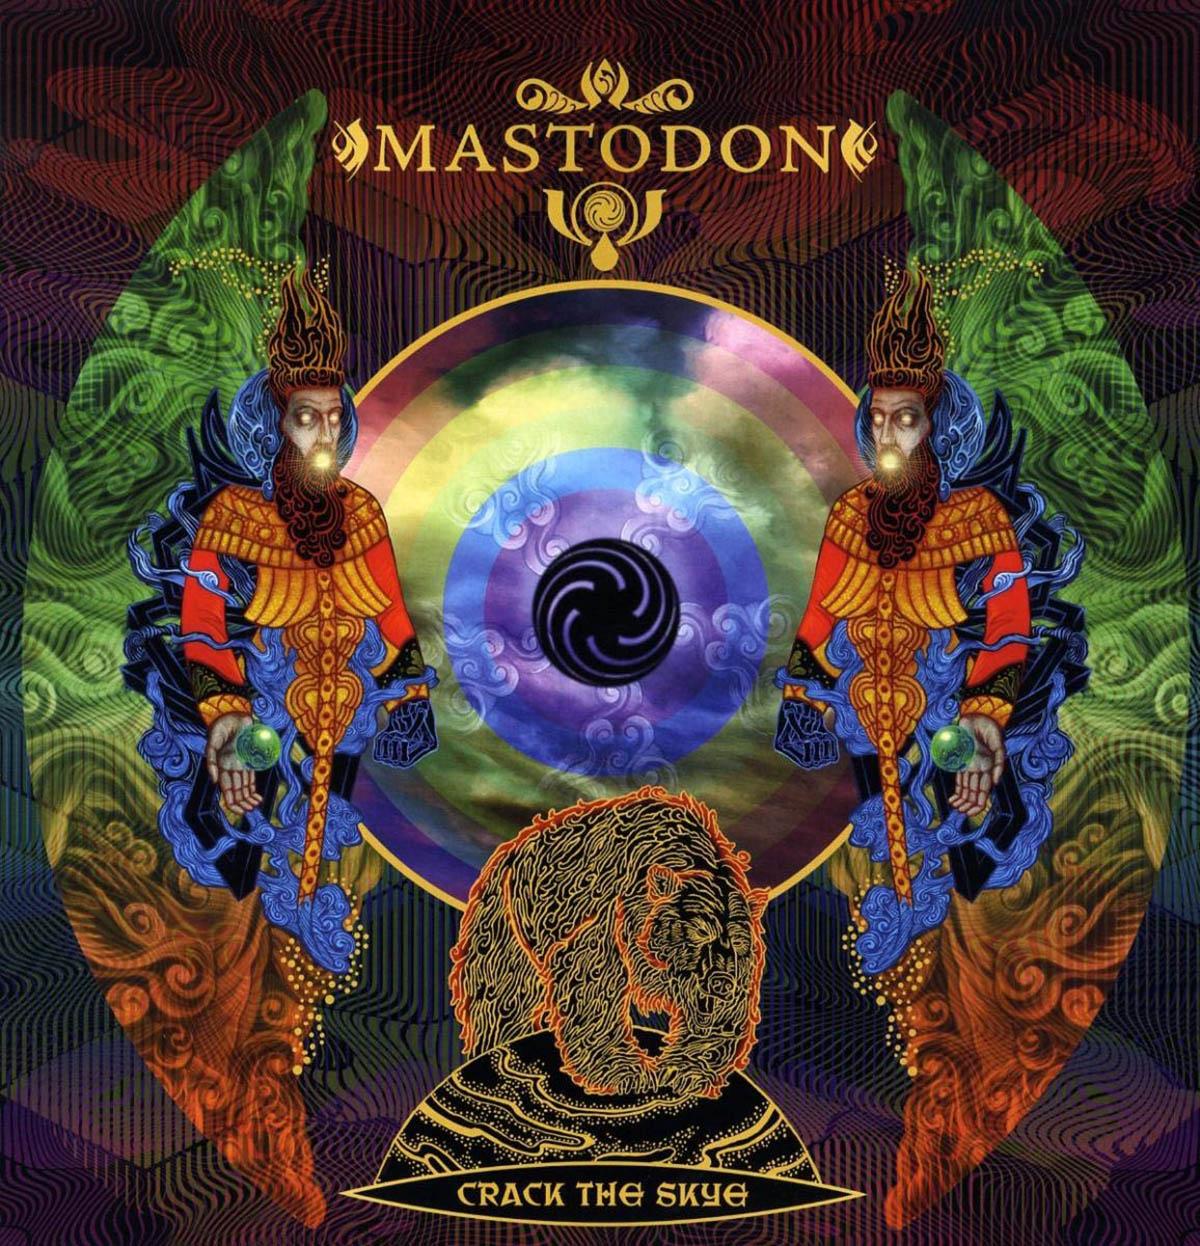 Mastodon, Crack the Skye